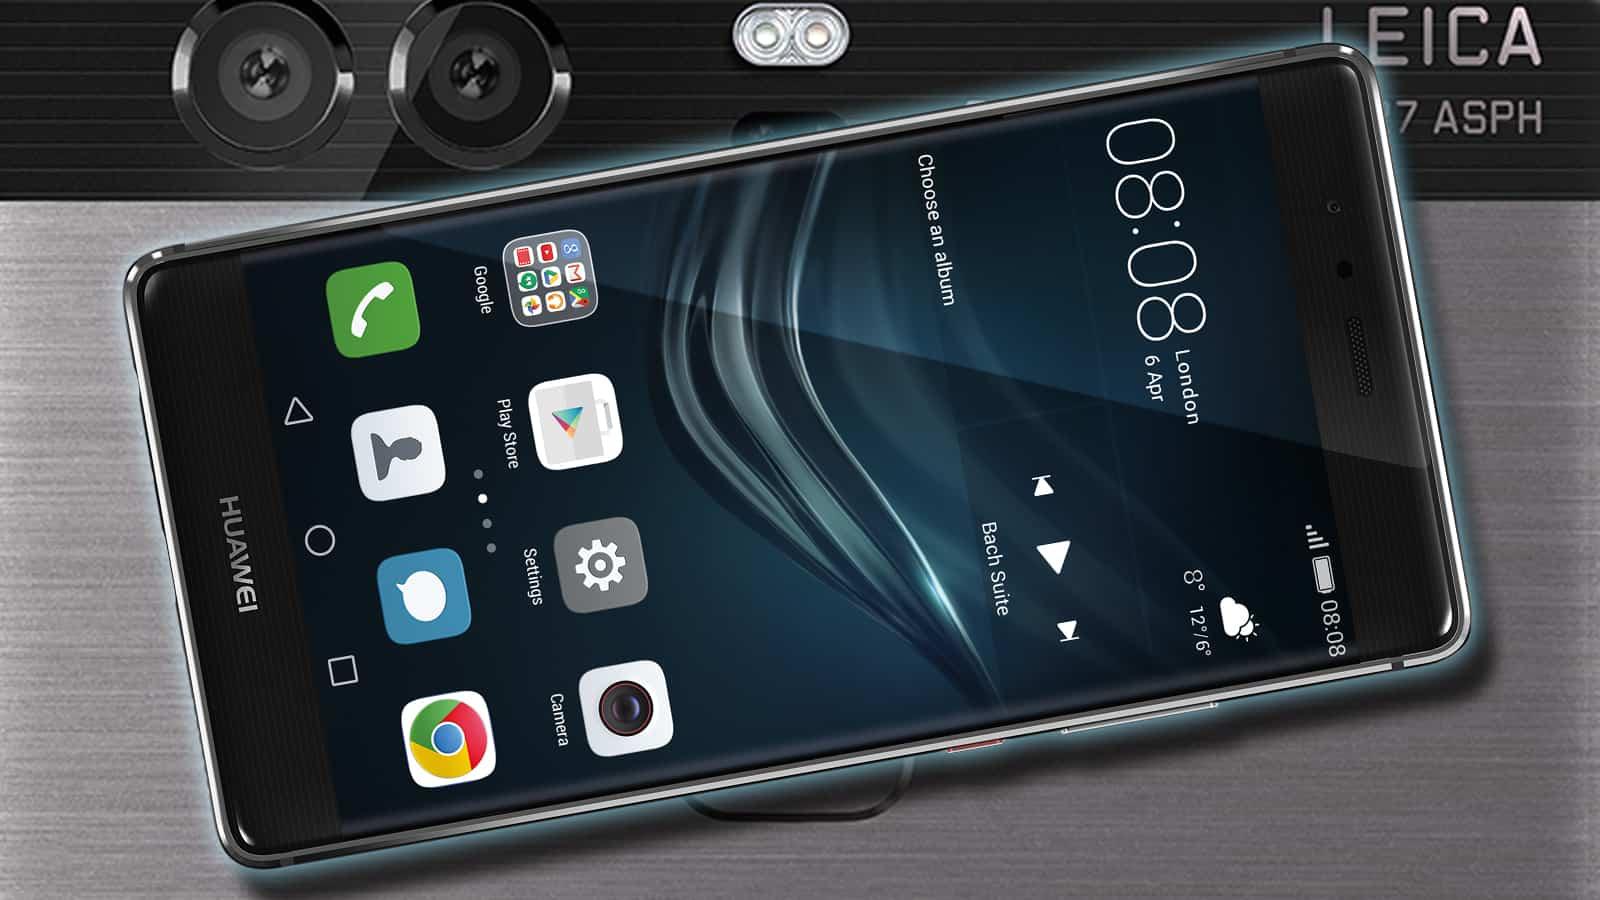 Huawei P9 Plus vs Xiaomi Redmi Pro